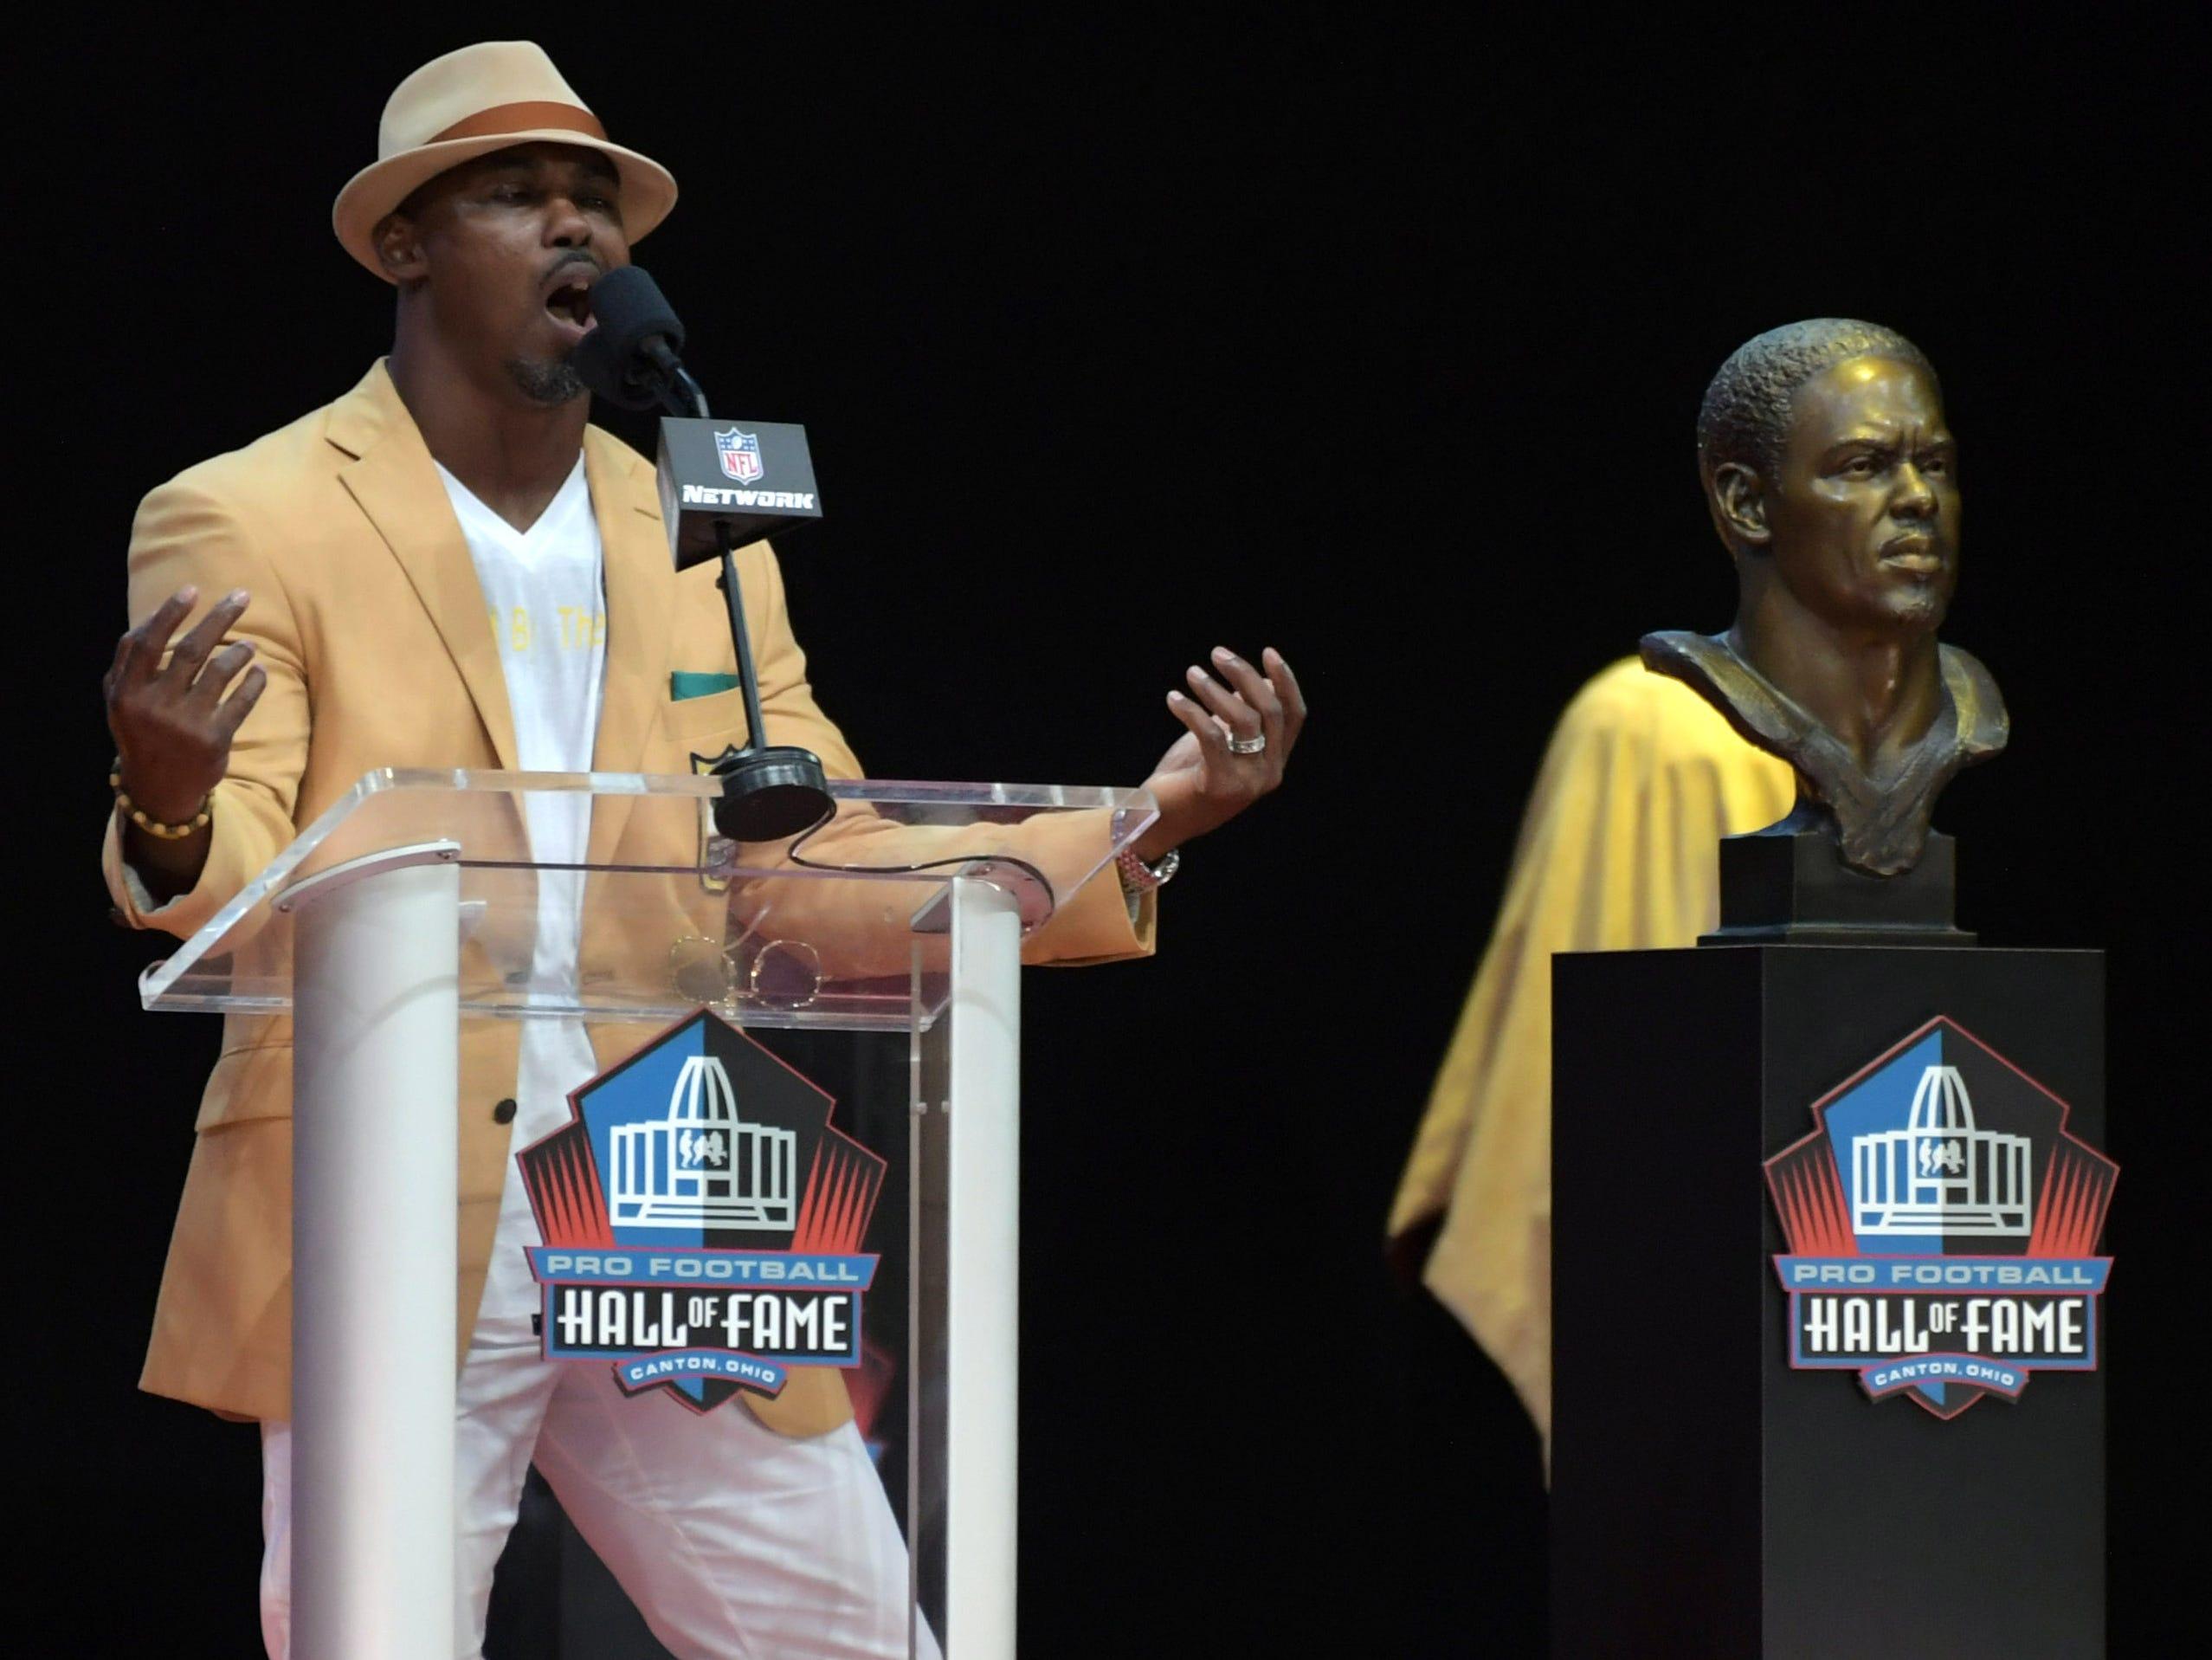 Former Philadelphia Eagles and Denver Broncos safety Brian Dawkins speaks during the Pro Football Hall of Fame Enshrinement Ceremony at Tom Bensen Stadium.